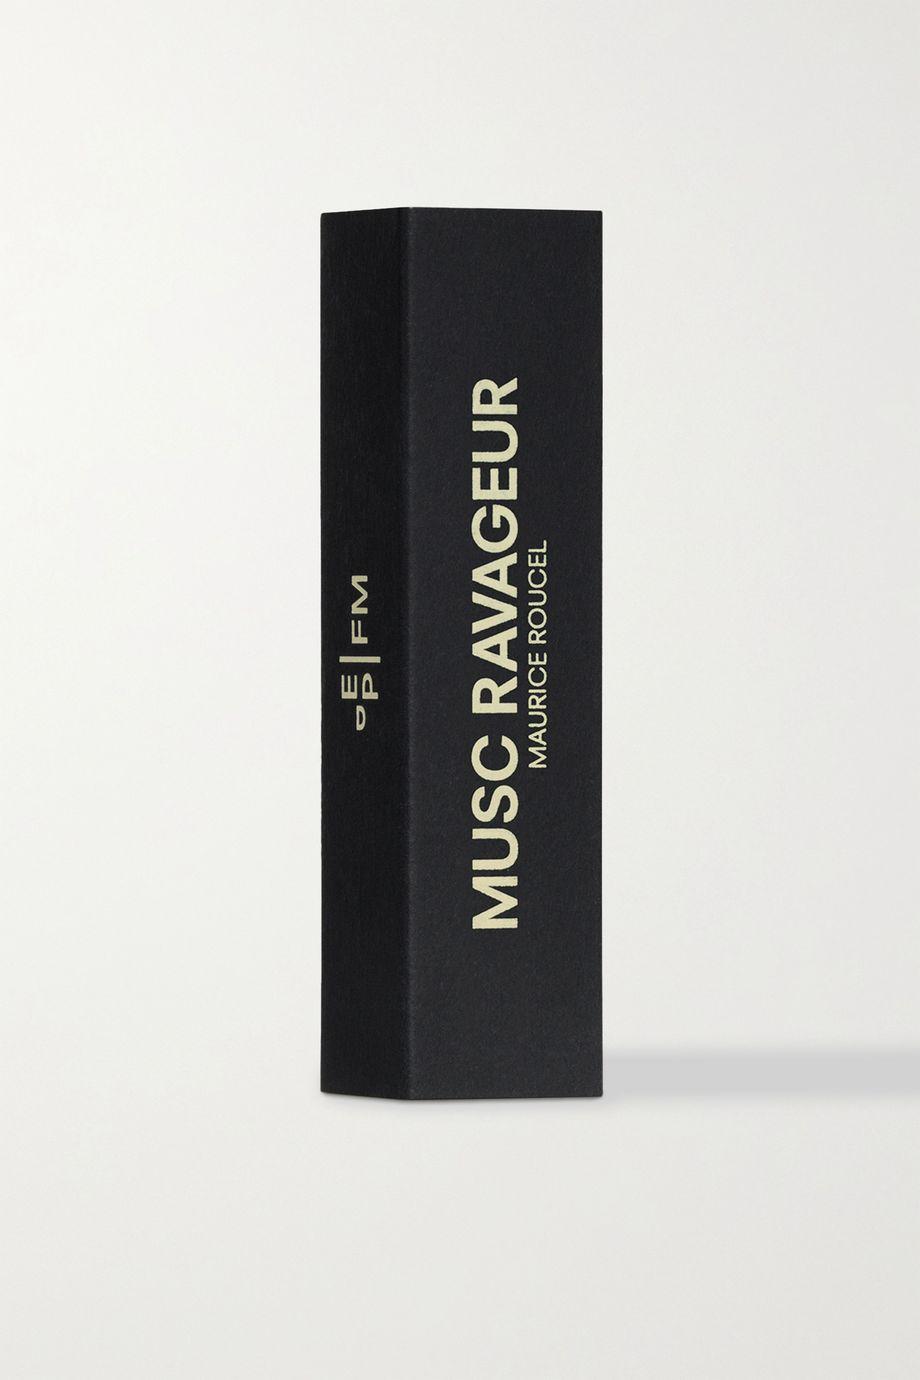 Frederic Malle Musc Ravageur Eau de Parfum - Musk & Amber, 10ml